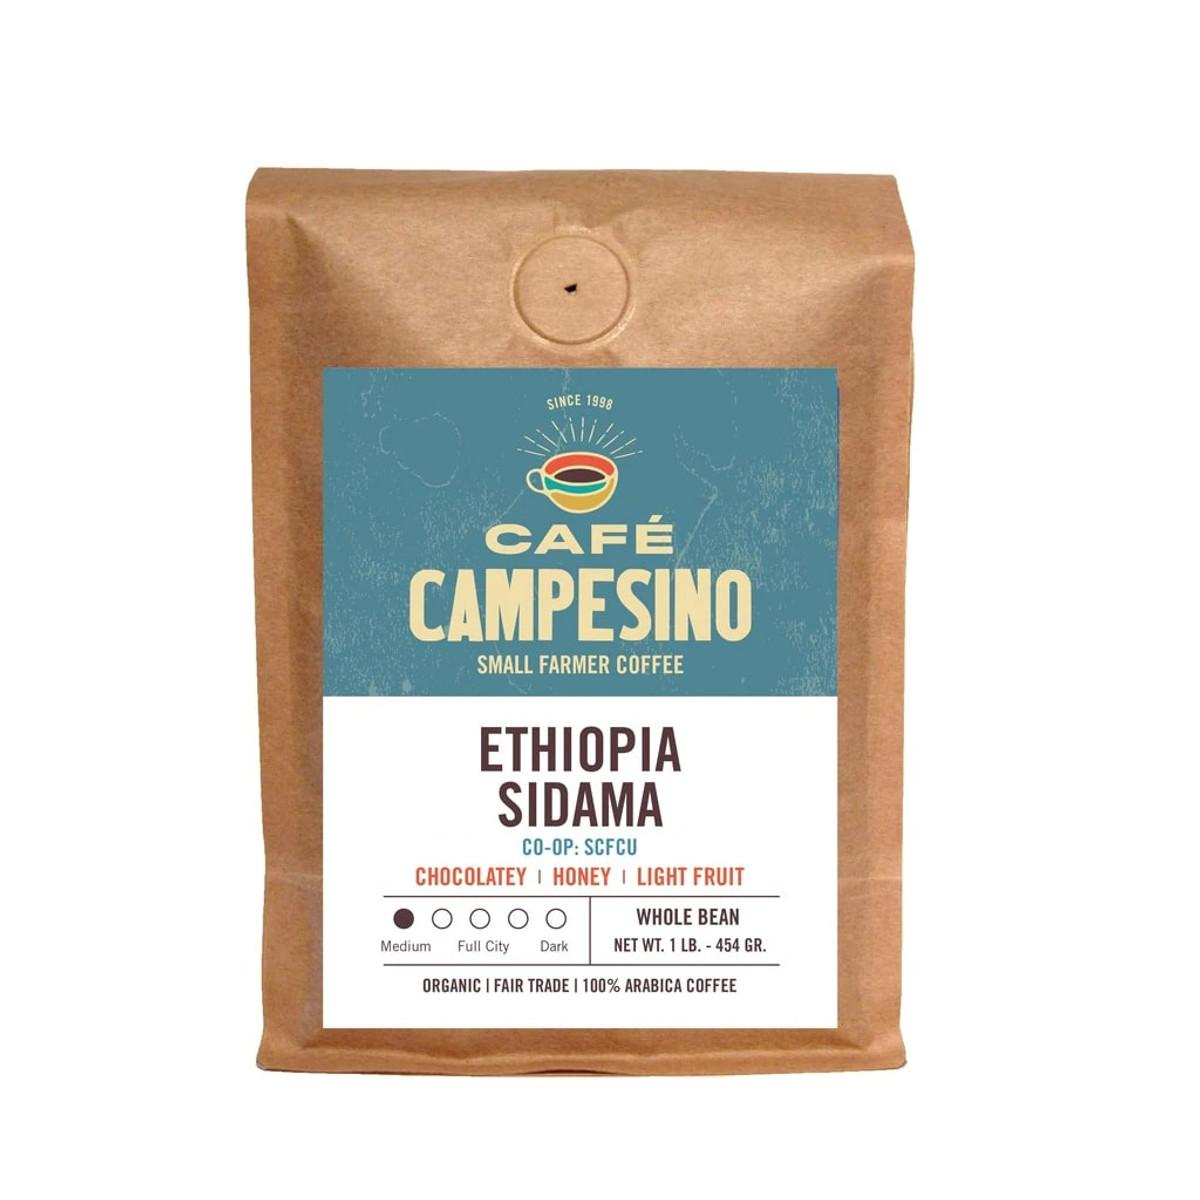 Fair trade, organic, shade-grown, arabica coffee grwon by the Fero Cooperative of the SCFCU in Sidama, Ethiopia.